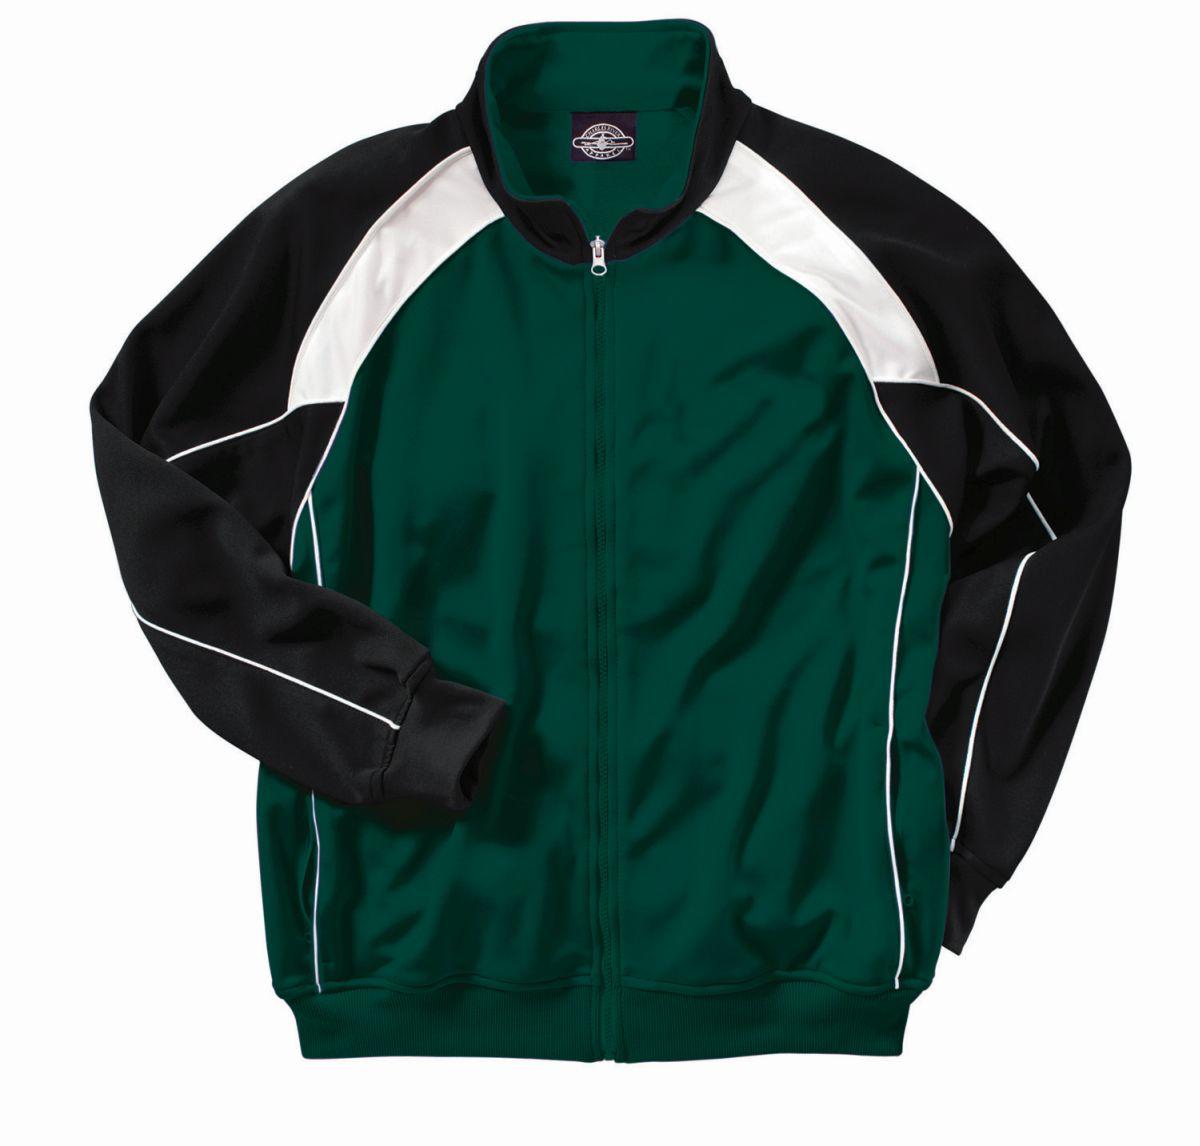 Boys'Olympian Jacket